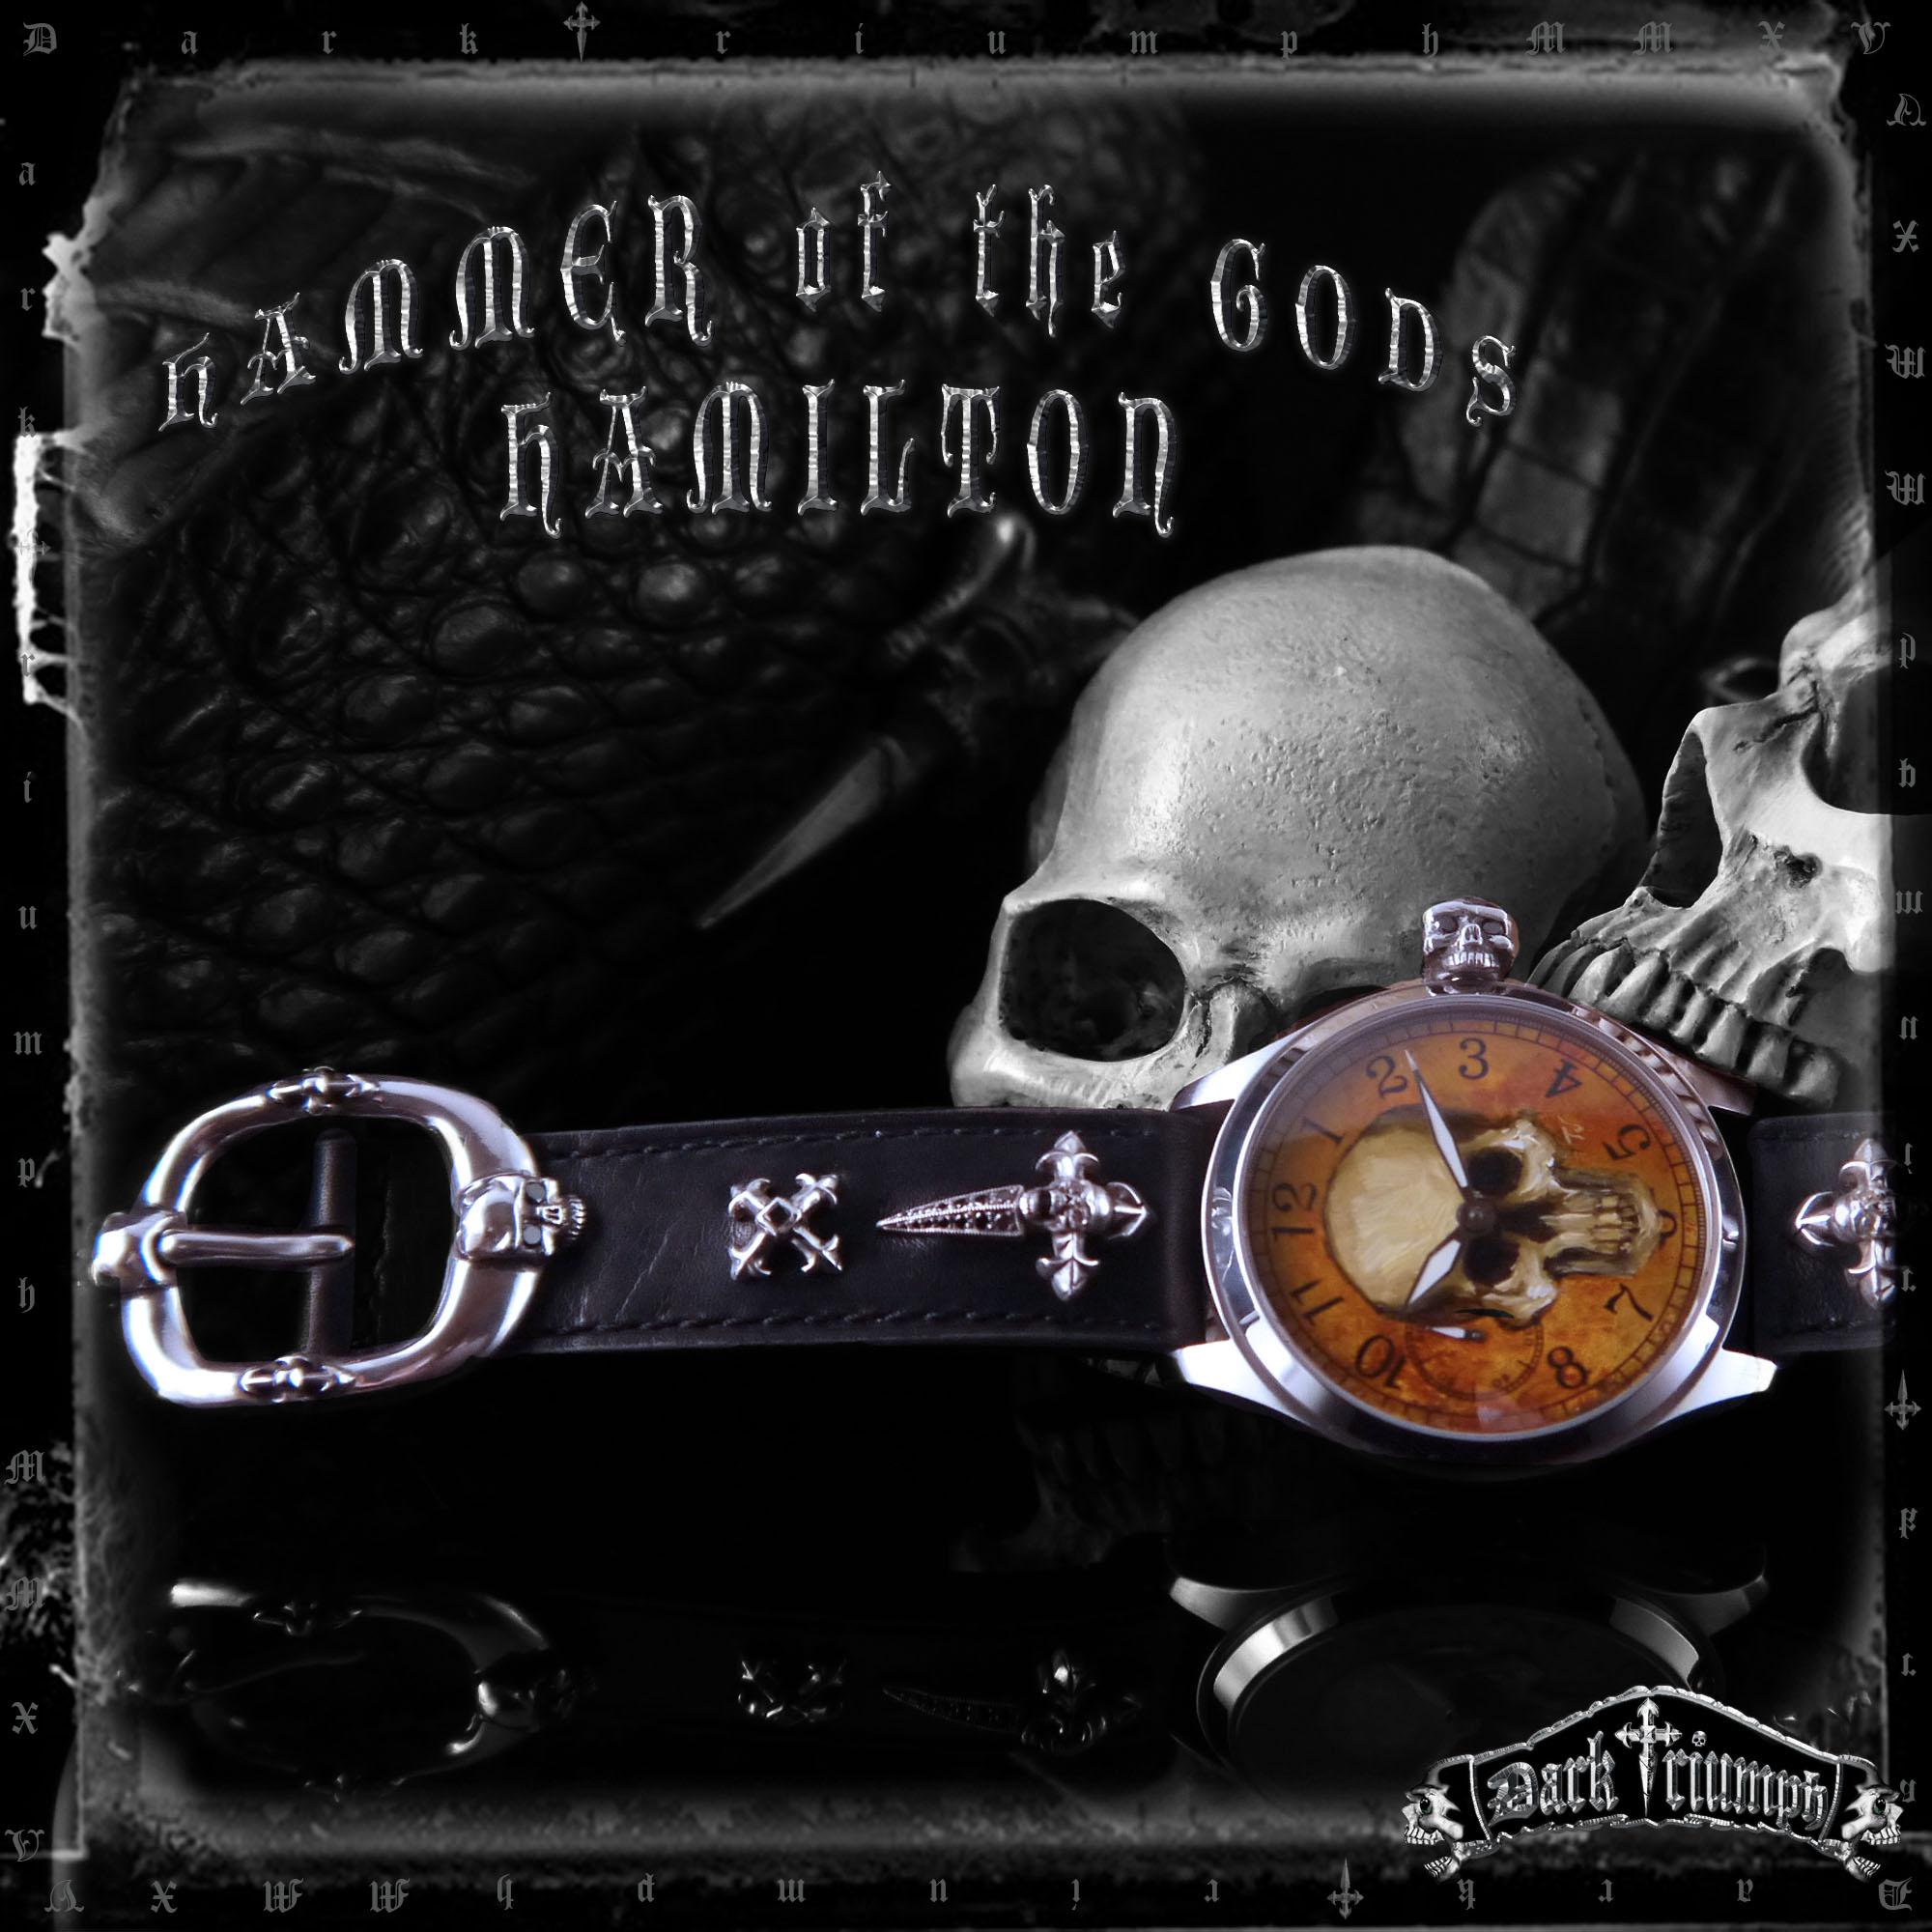 hammer-of-the-gods-hamilton.jpg